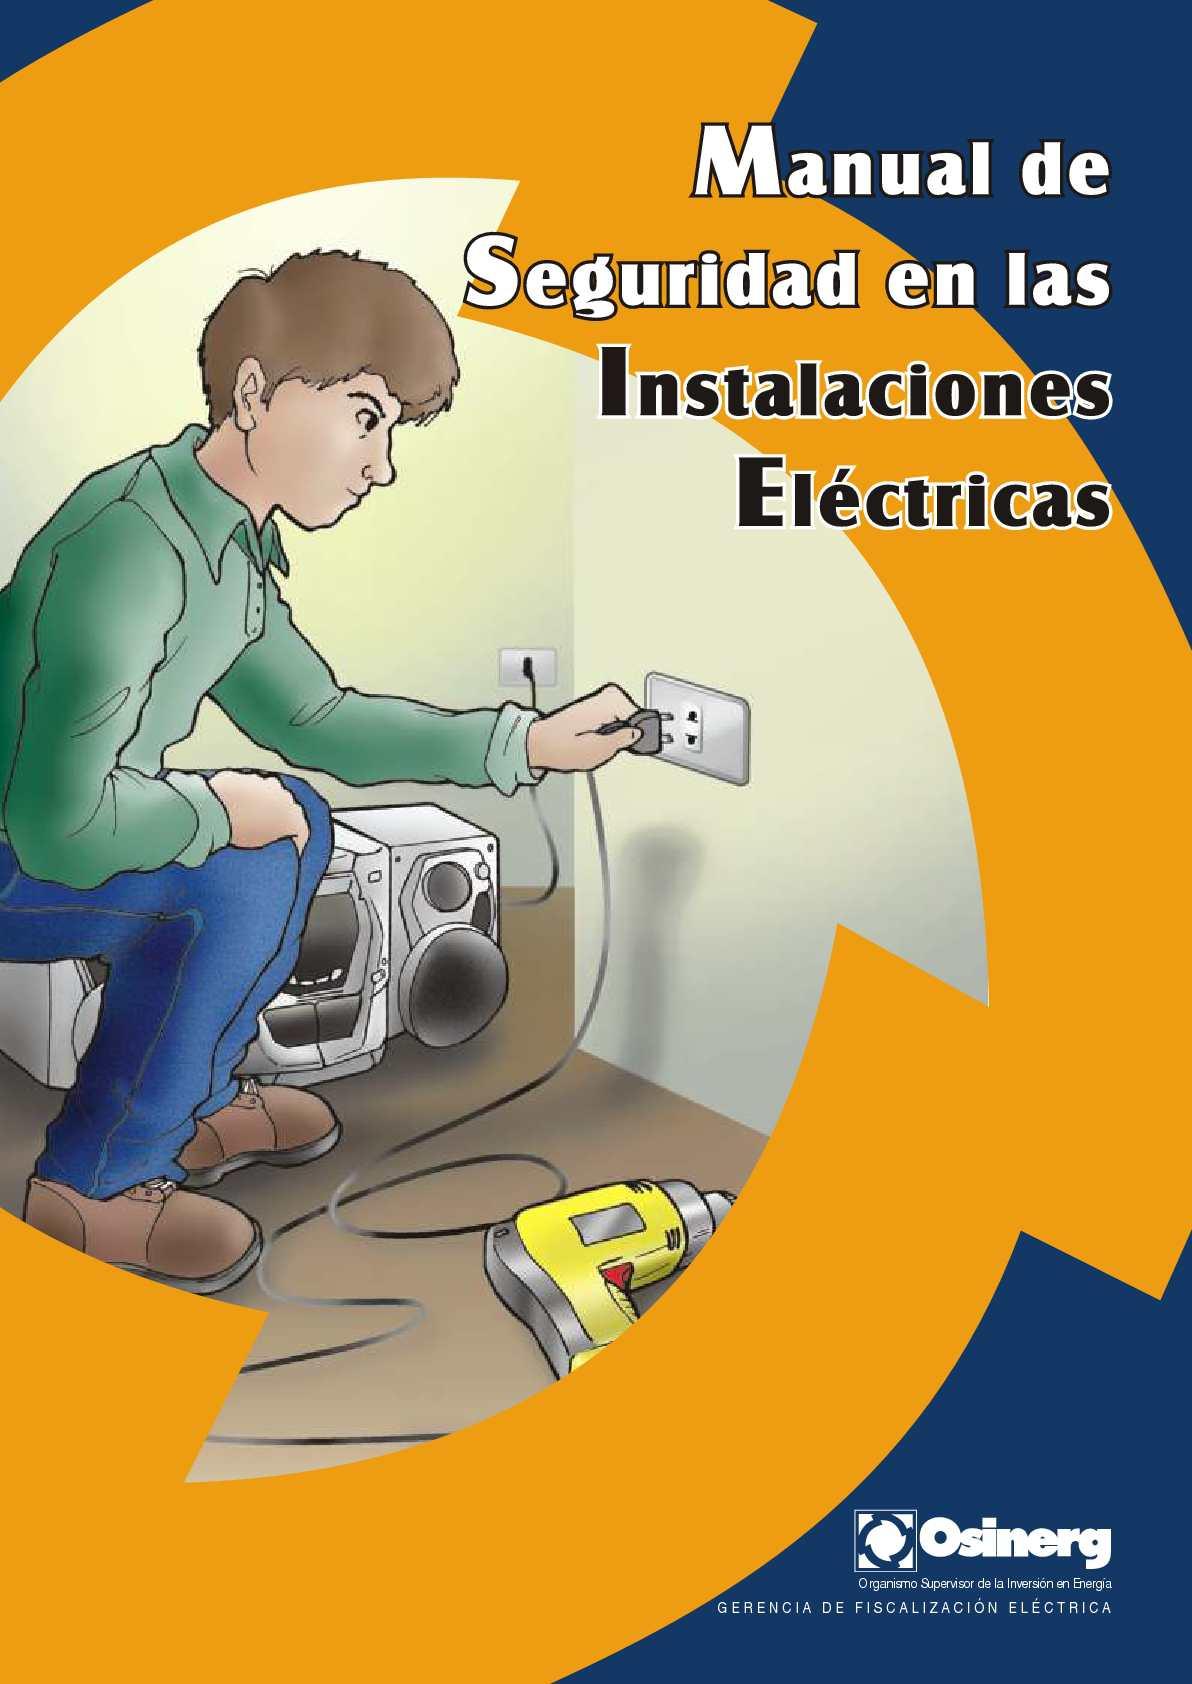 manual de instrucciones sud pdf